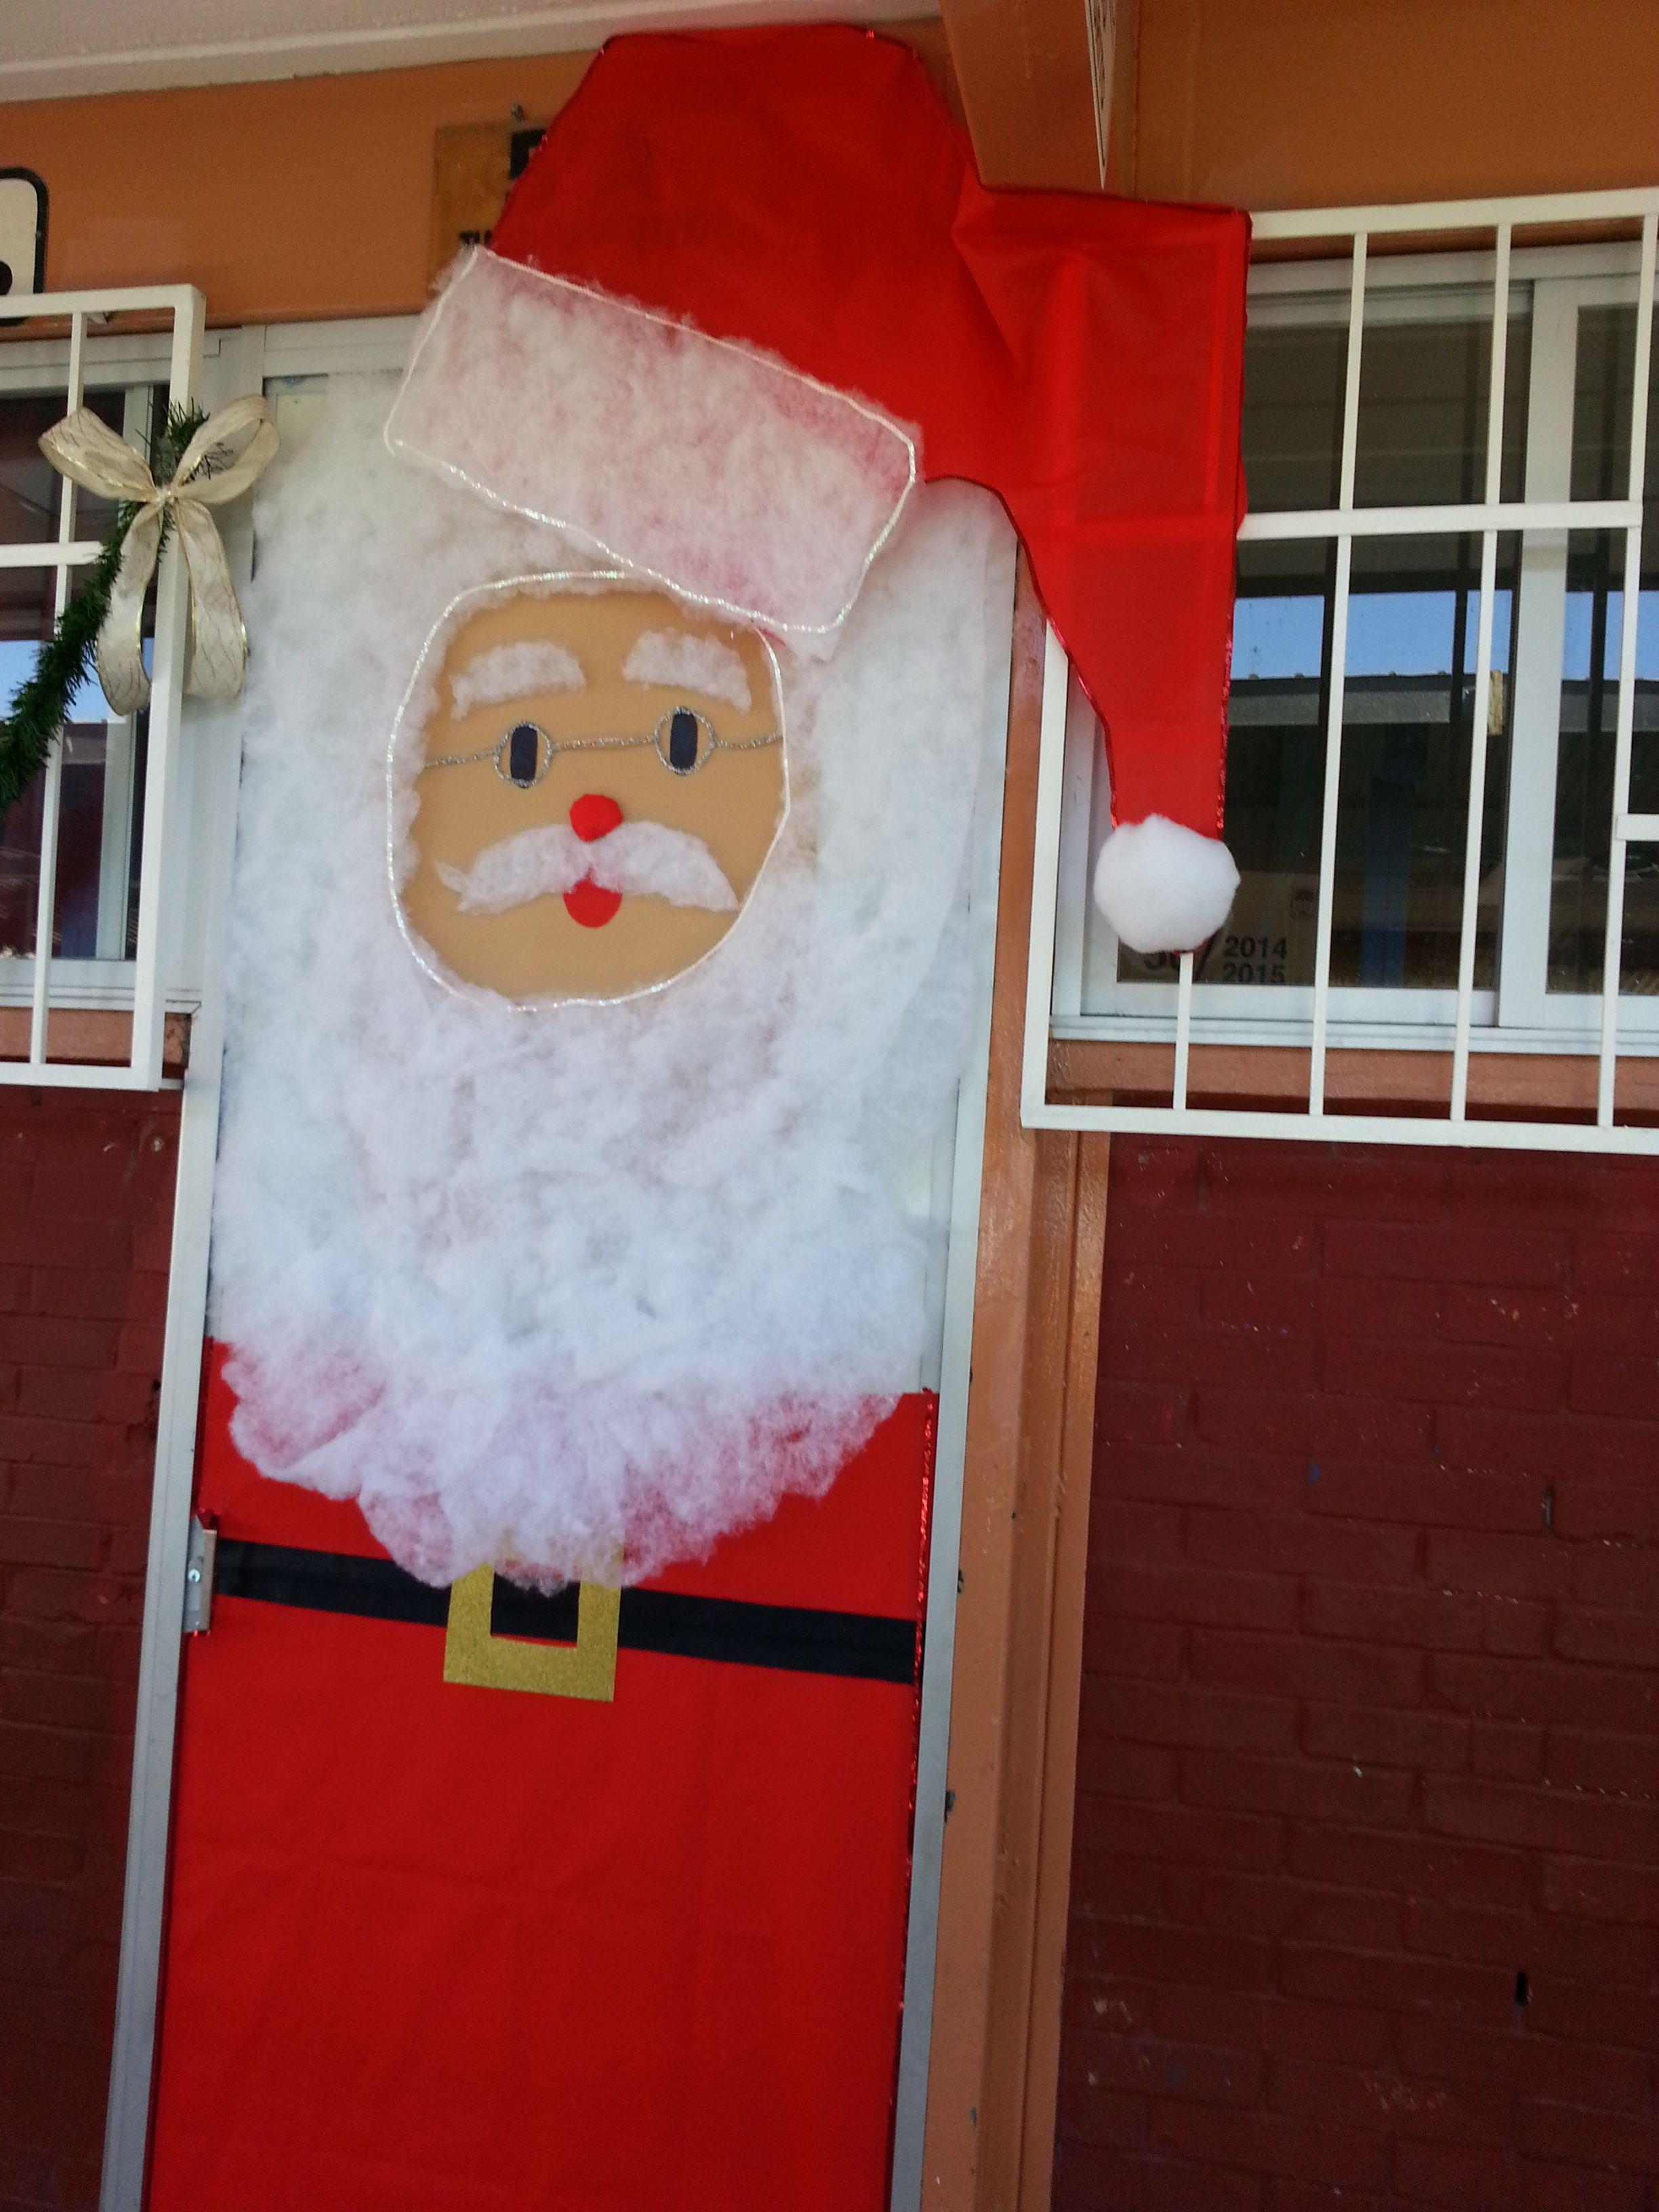 Puerta decorada de santa claus diciembre navidad for Puertas decoradas santa claus